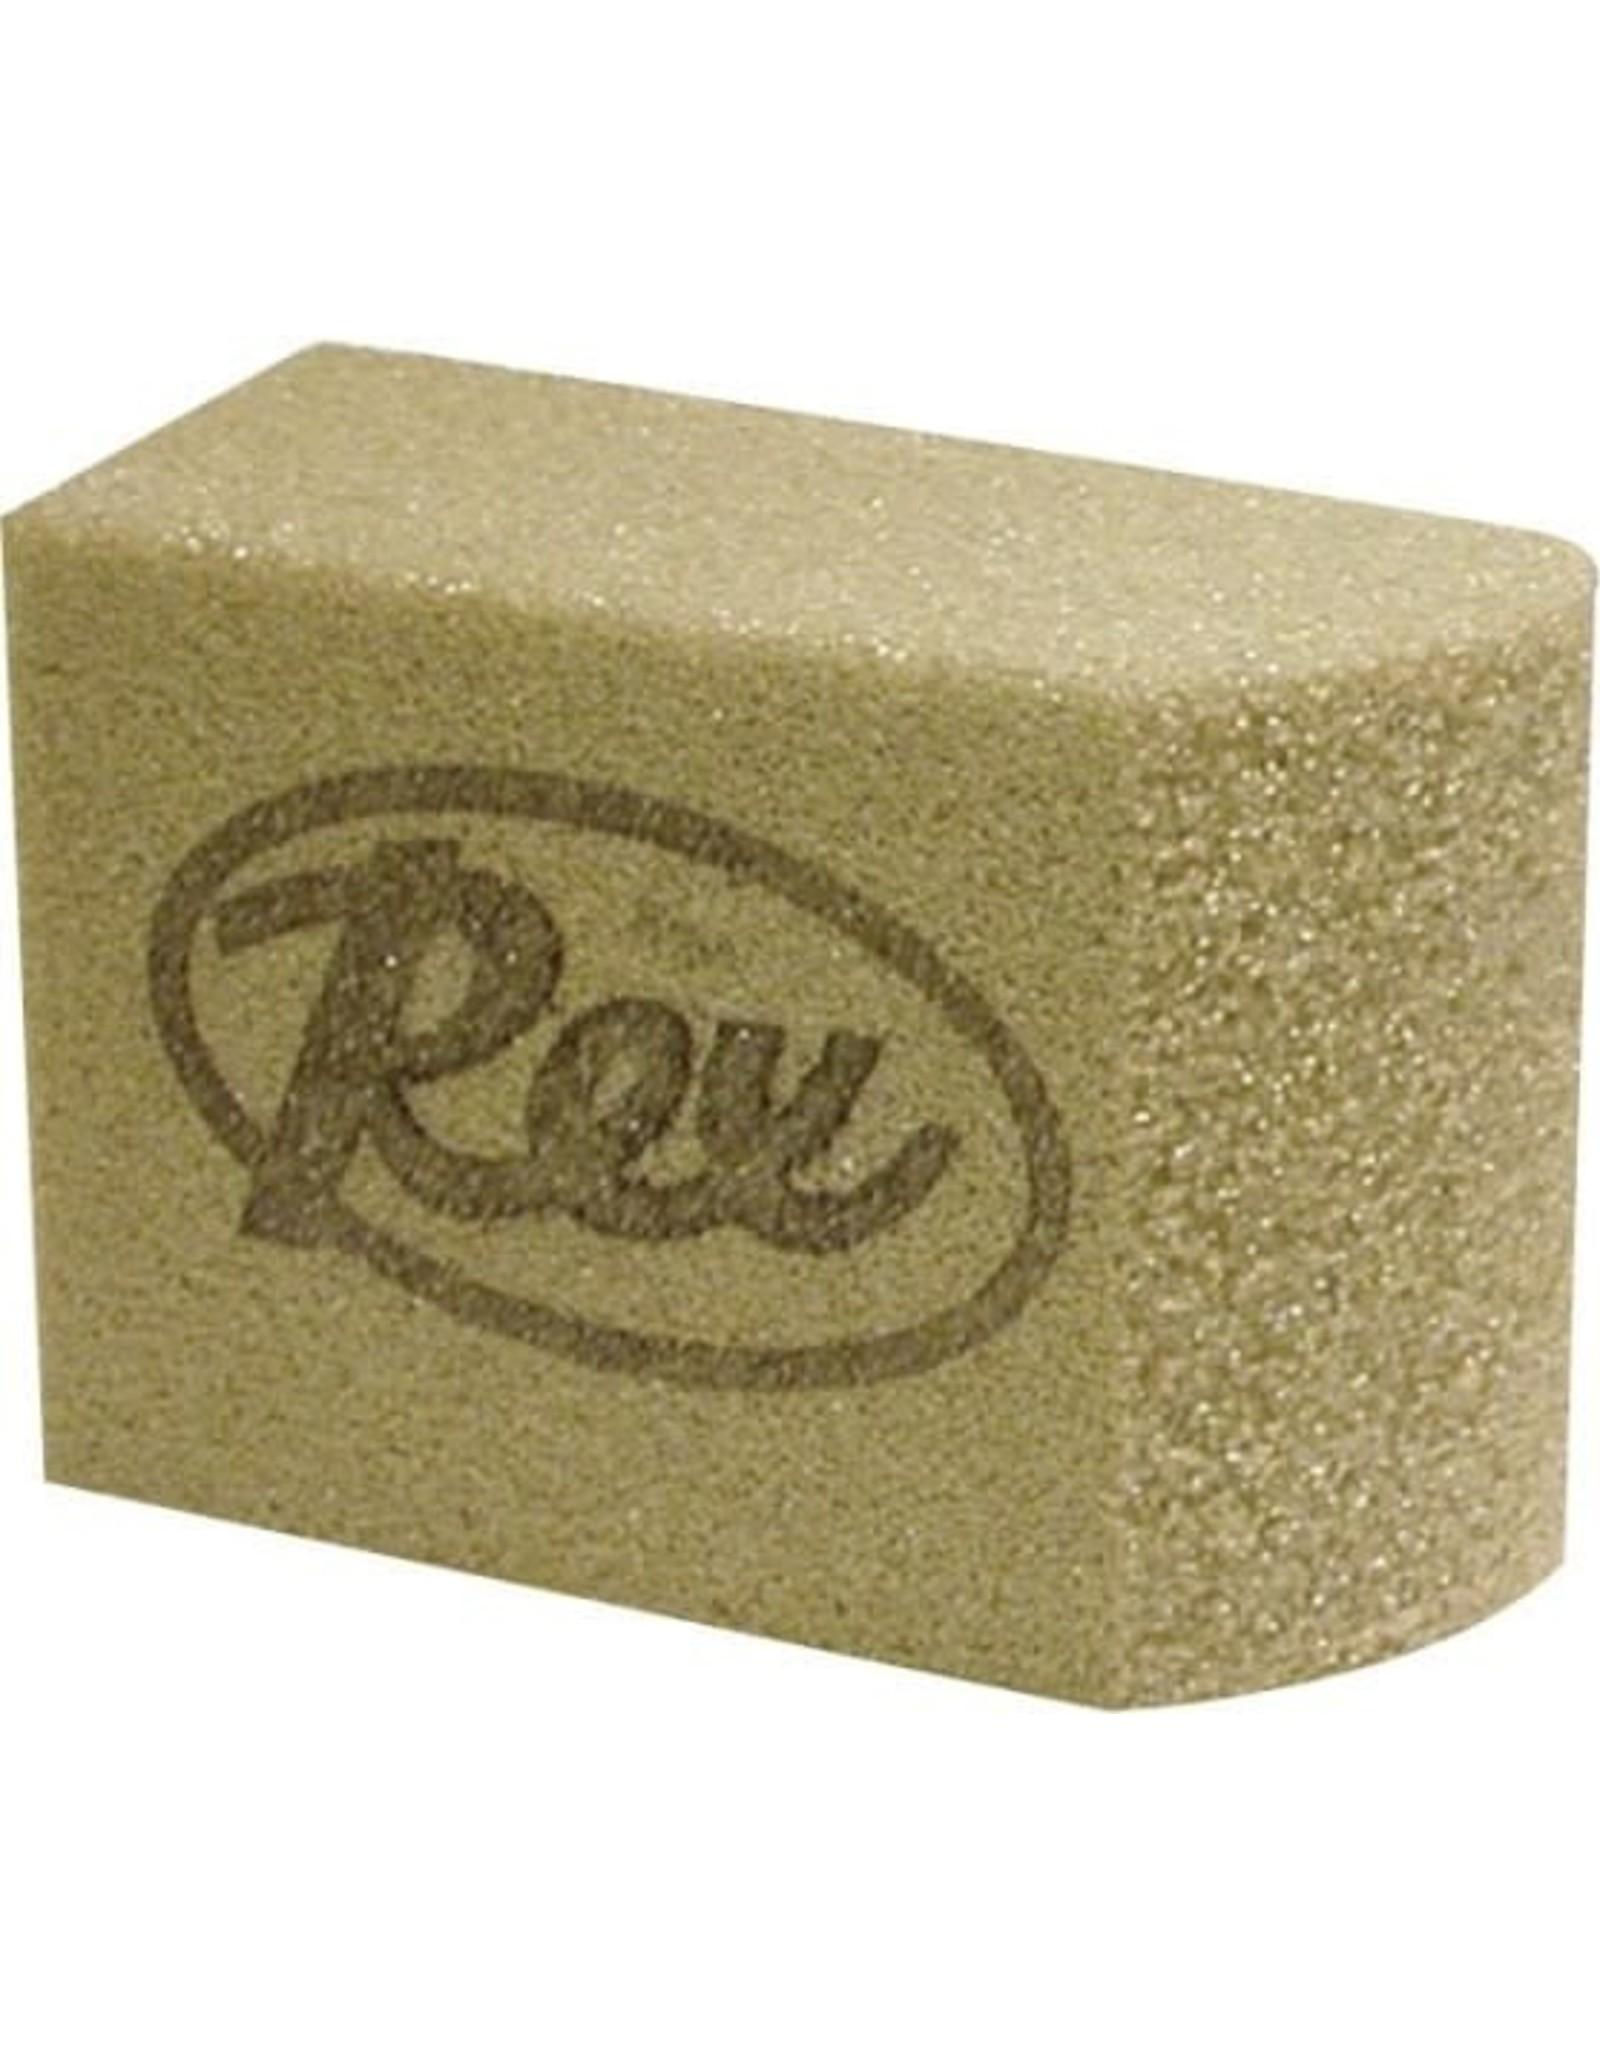 Rex Rex Synthetic Cork